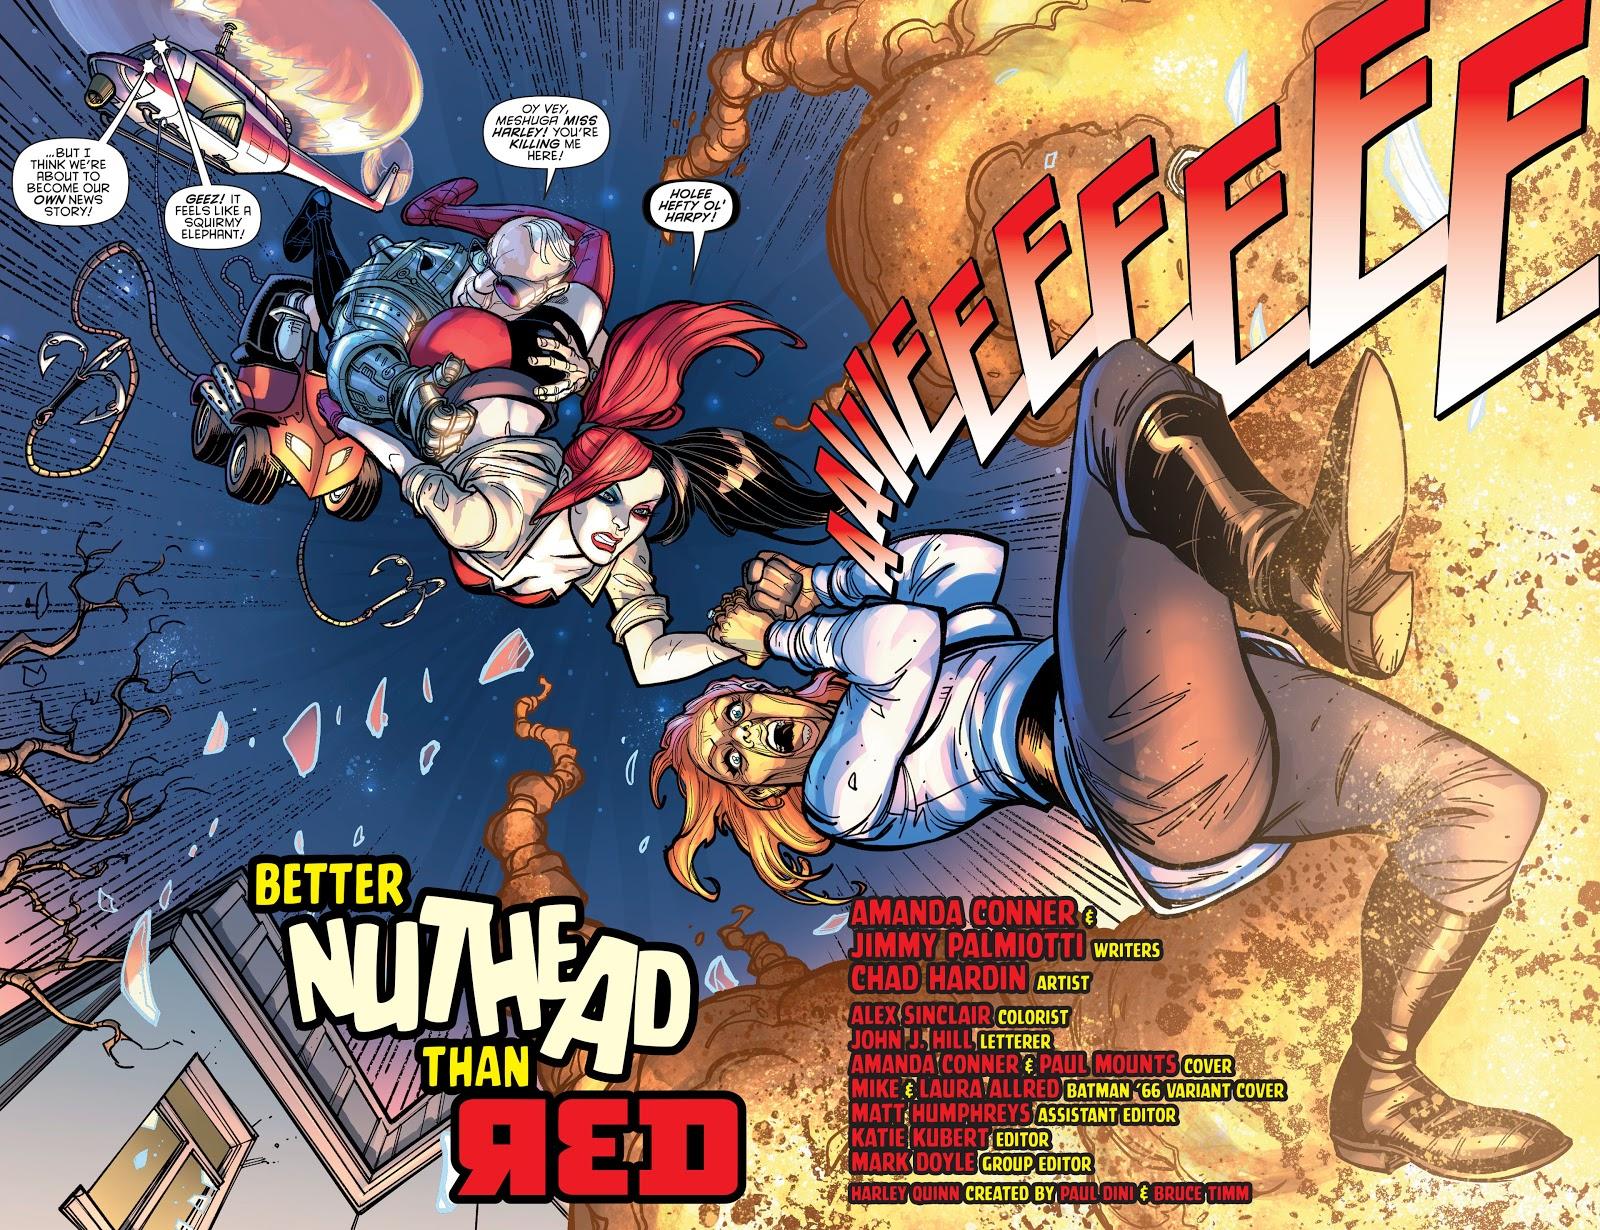 Harley Quinn Vol. 2 #6